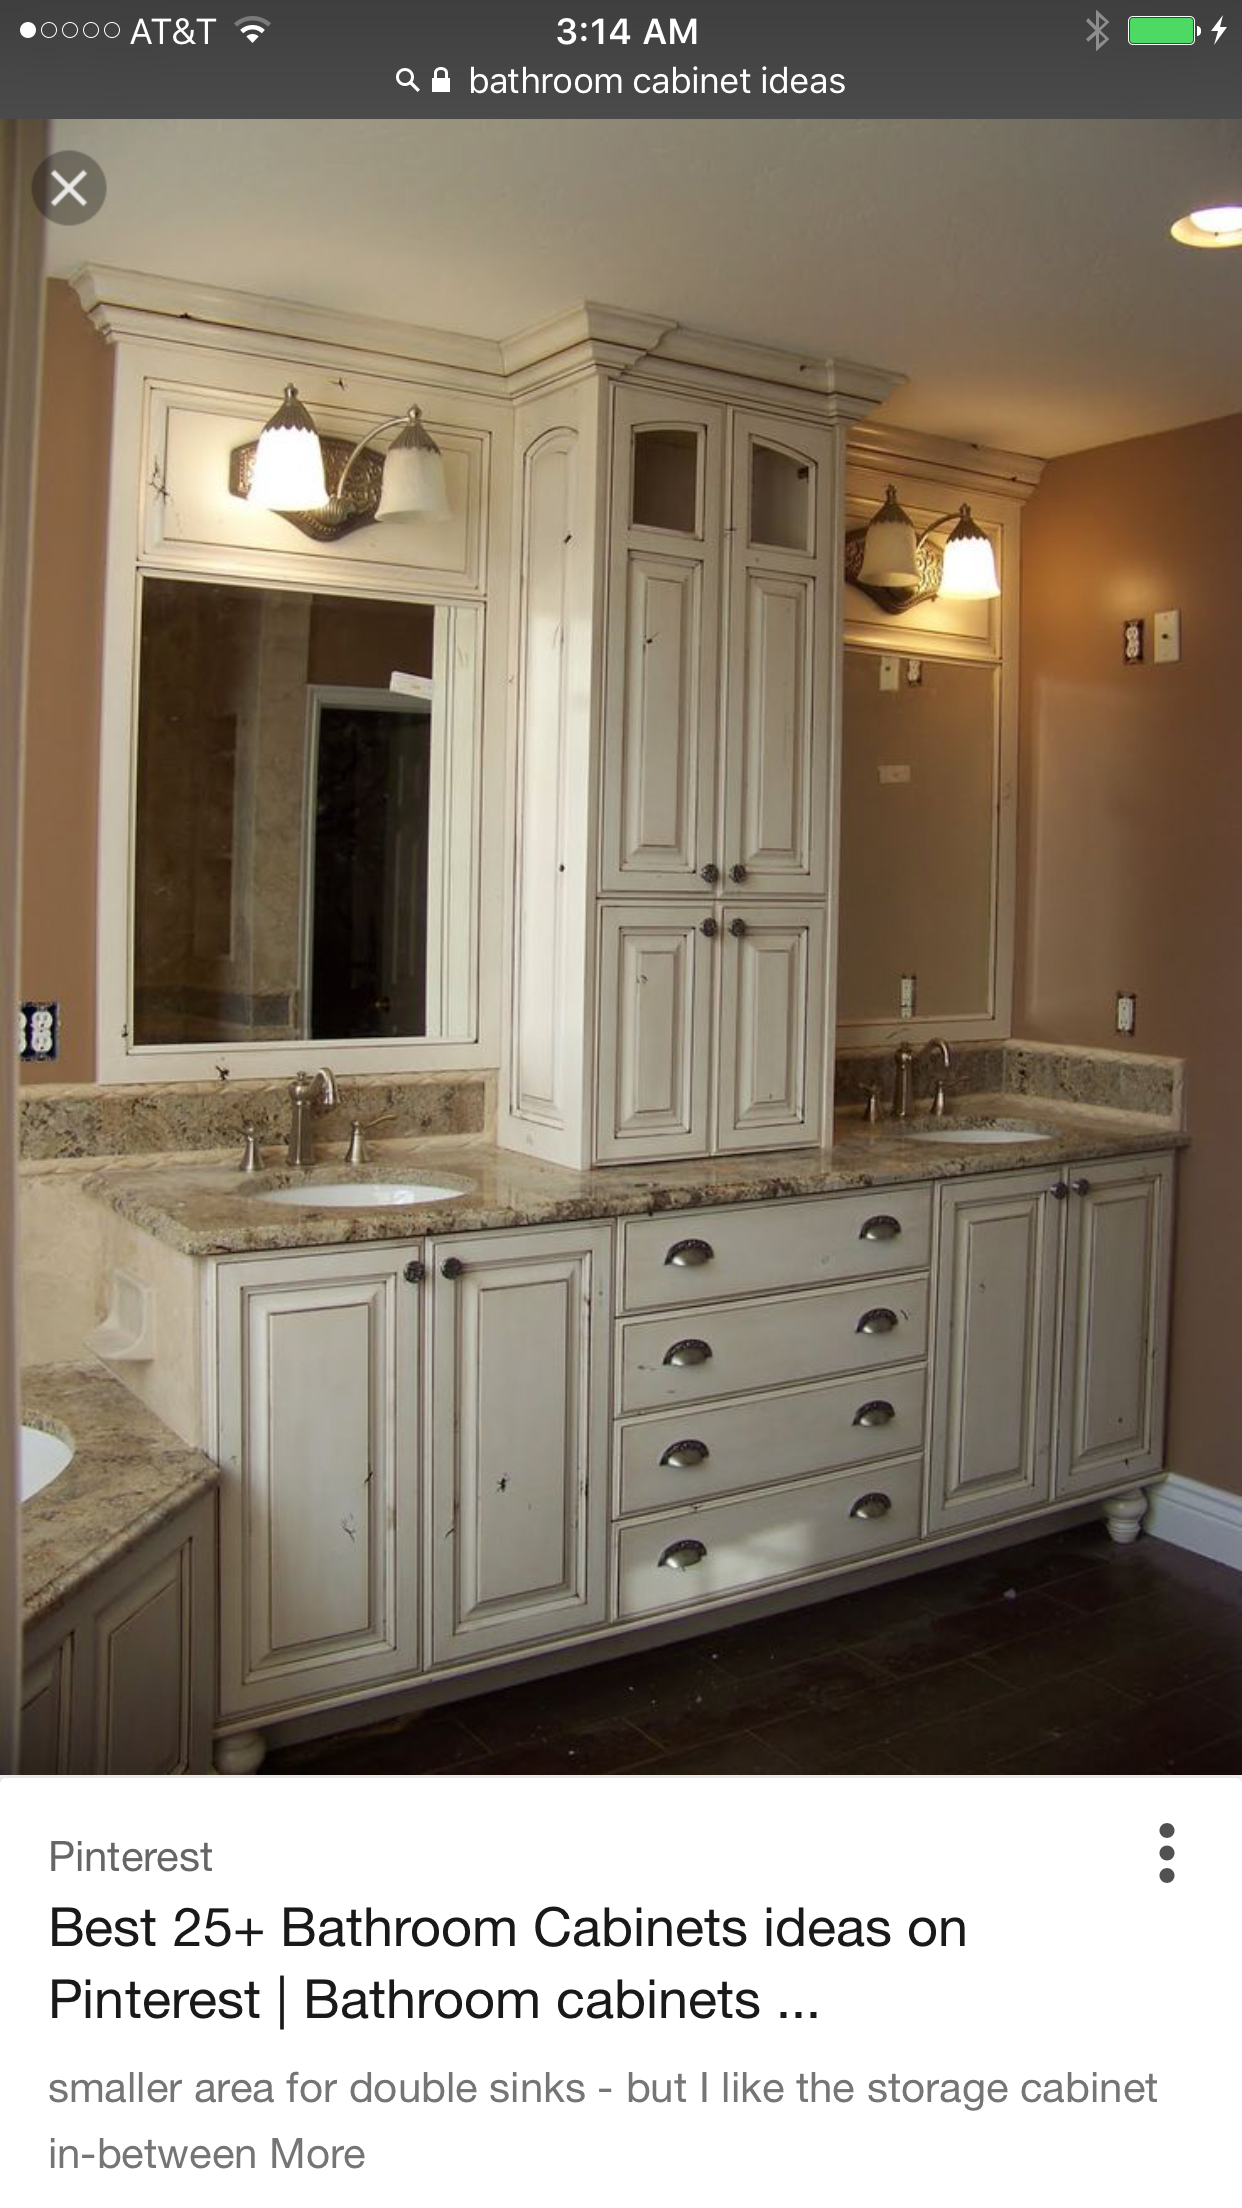 Pantry Doors Like That Bathrooms Bathroom Bathroom with regard to size 1242 X 2208